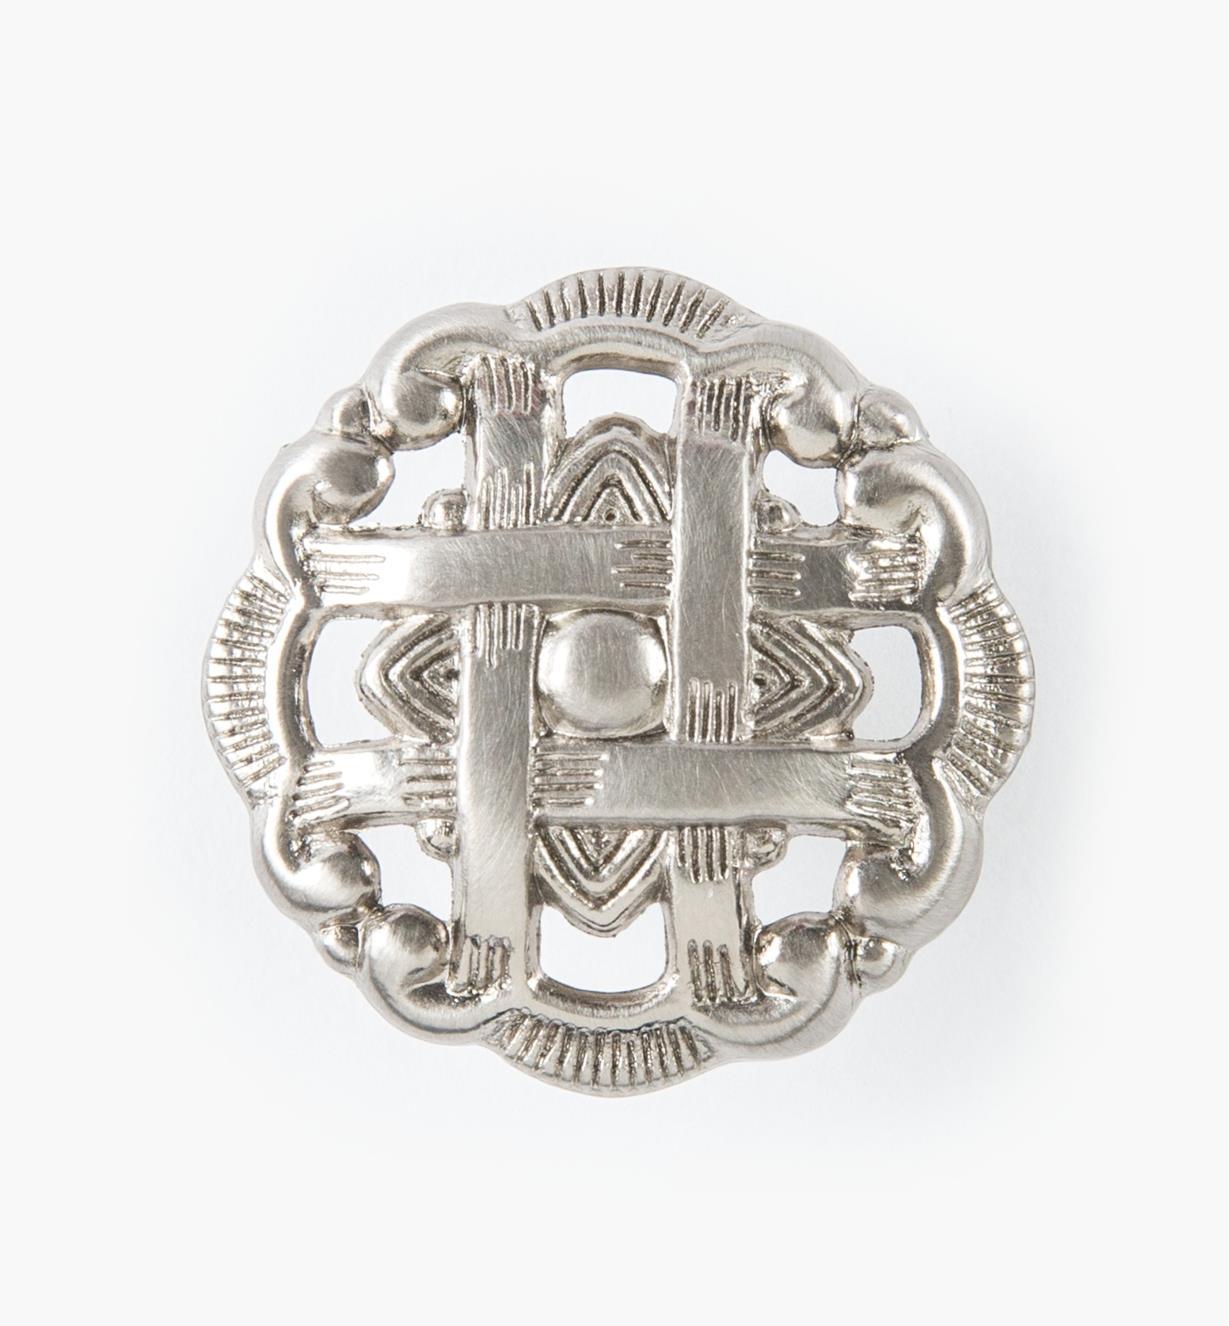 "03W2267 - 1 7/16"" x 3/4"" Belwith-Hickory Elegant Weave Knob, each"